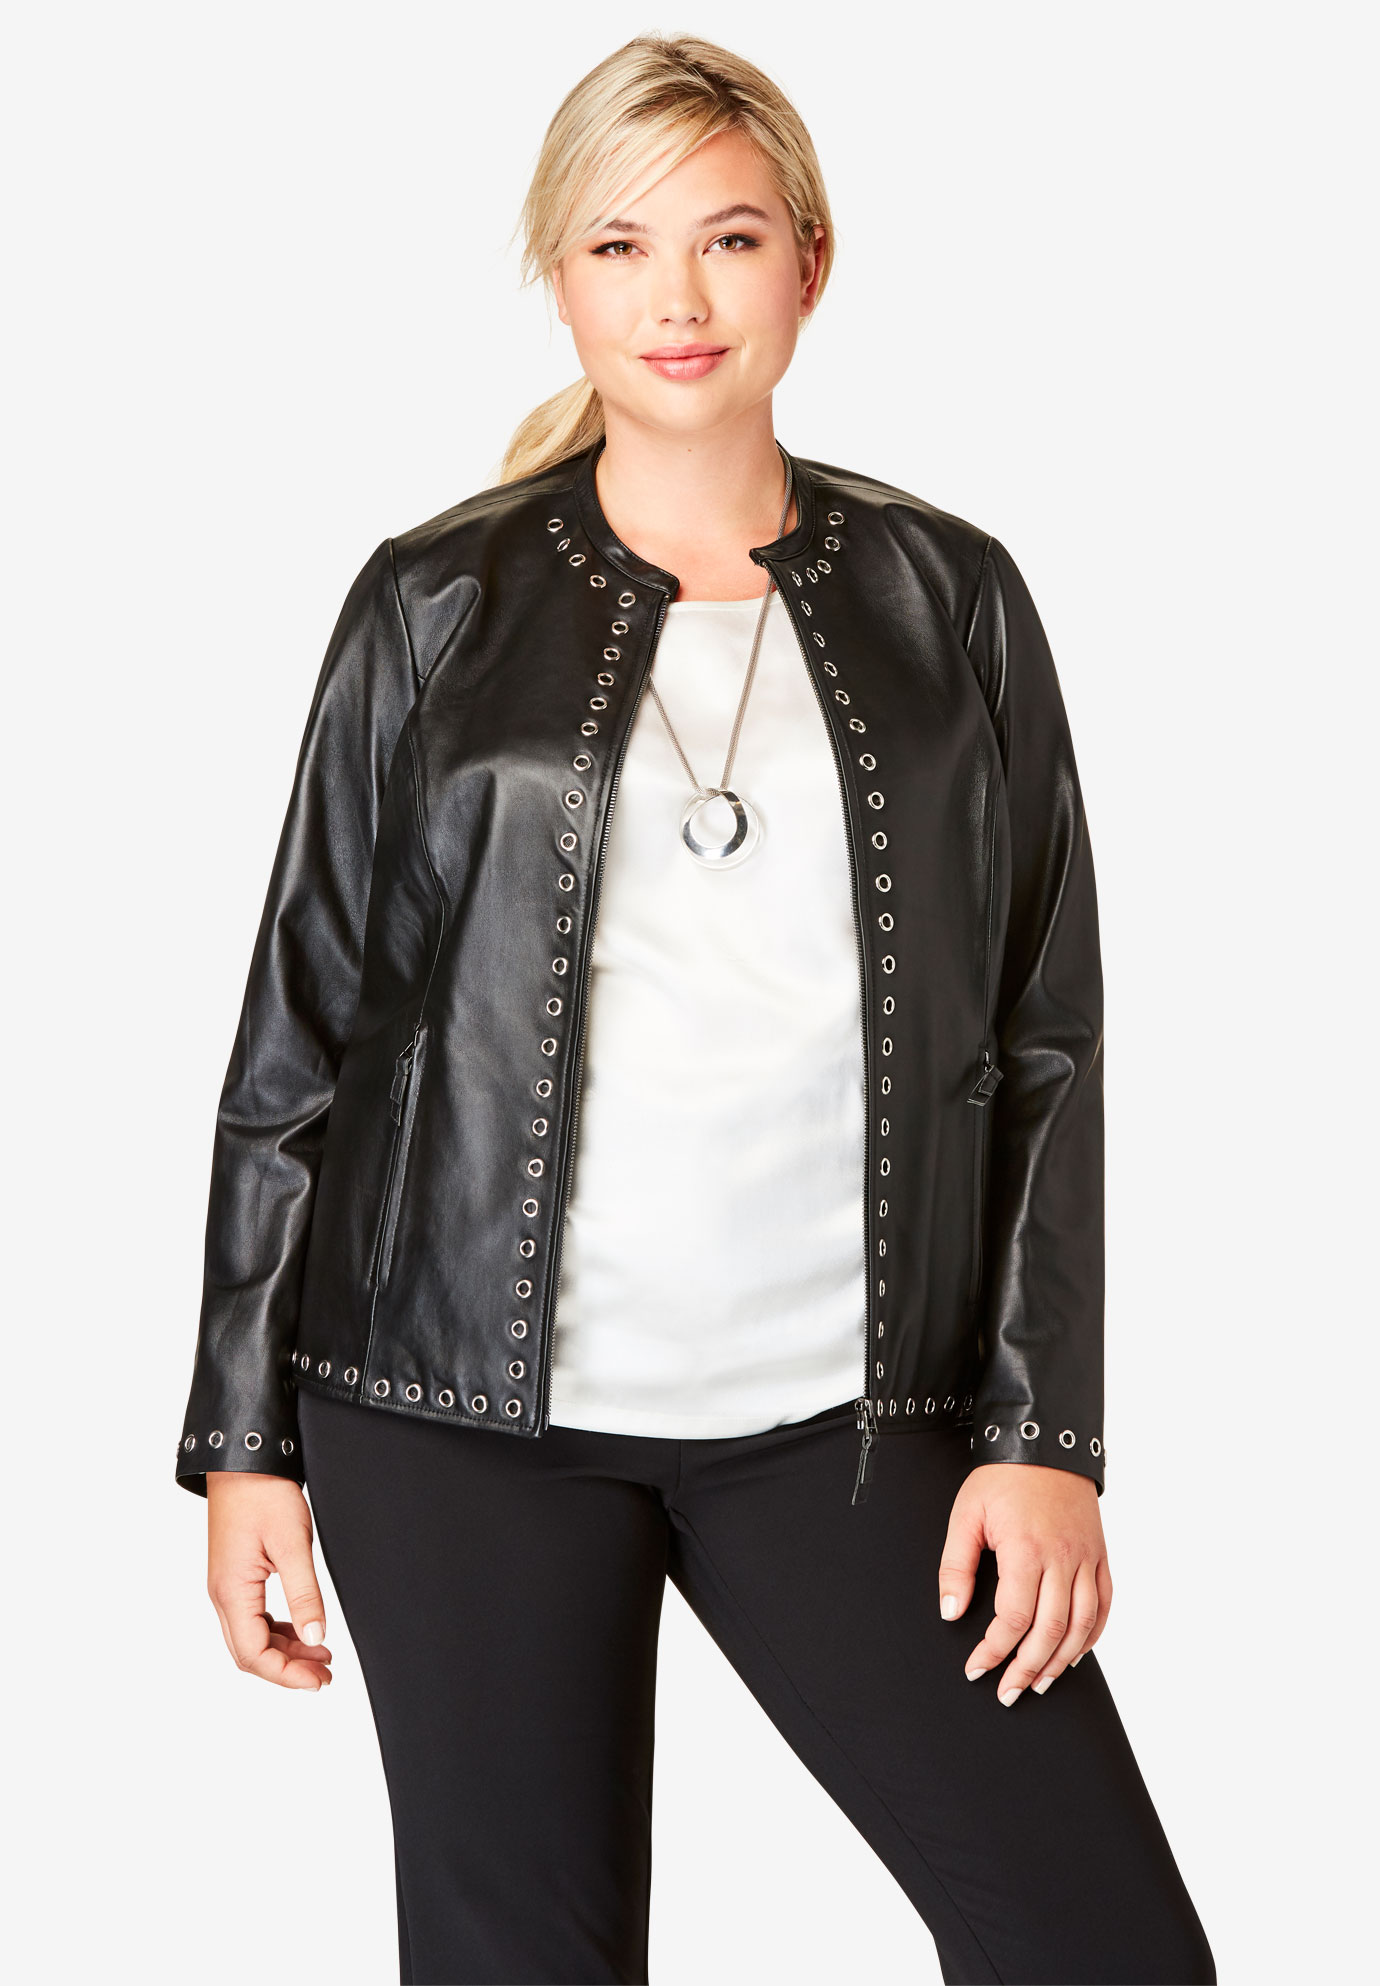 0a91ecf785979 Embellished Leather Jacket